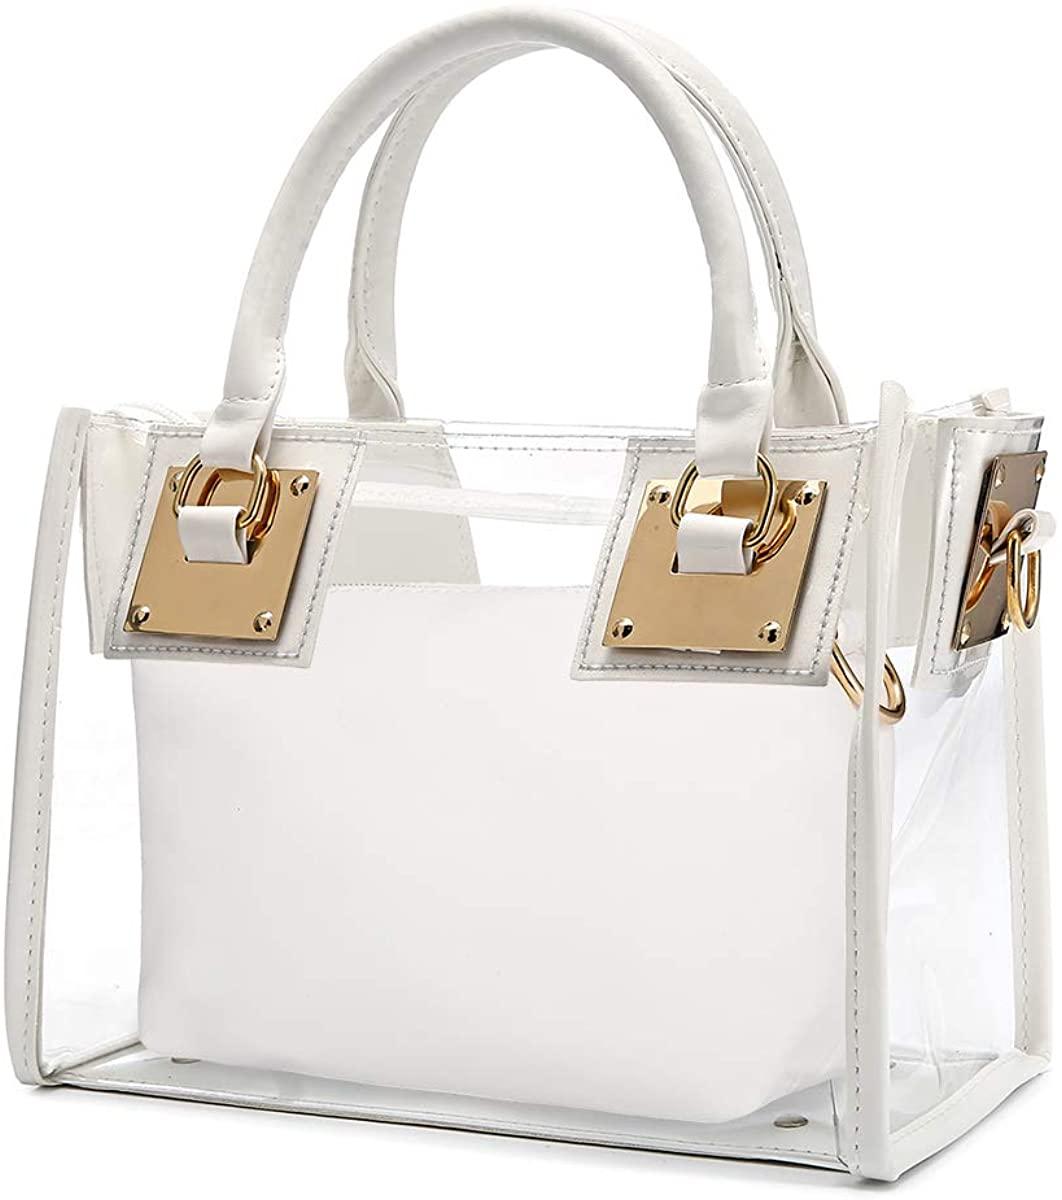 Clear Crossbody Handbags, OURBAG Fashion Women's Waterproof Clear Handbag Top Handle Shoulder Bag Transparent Purse